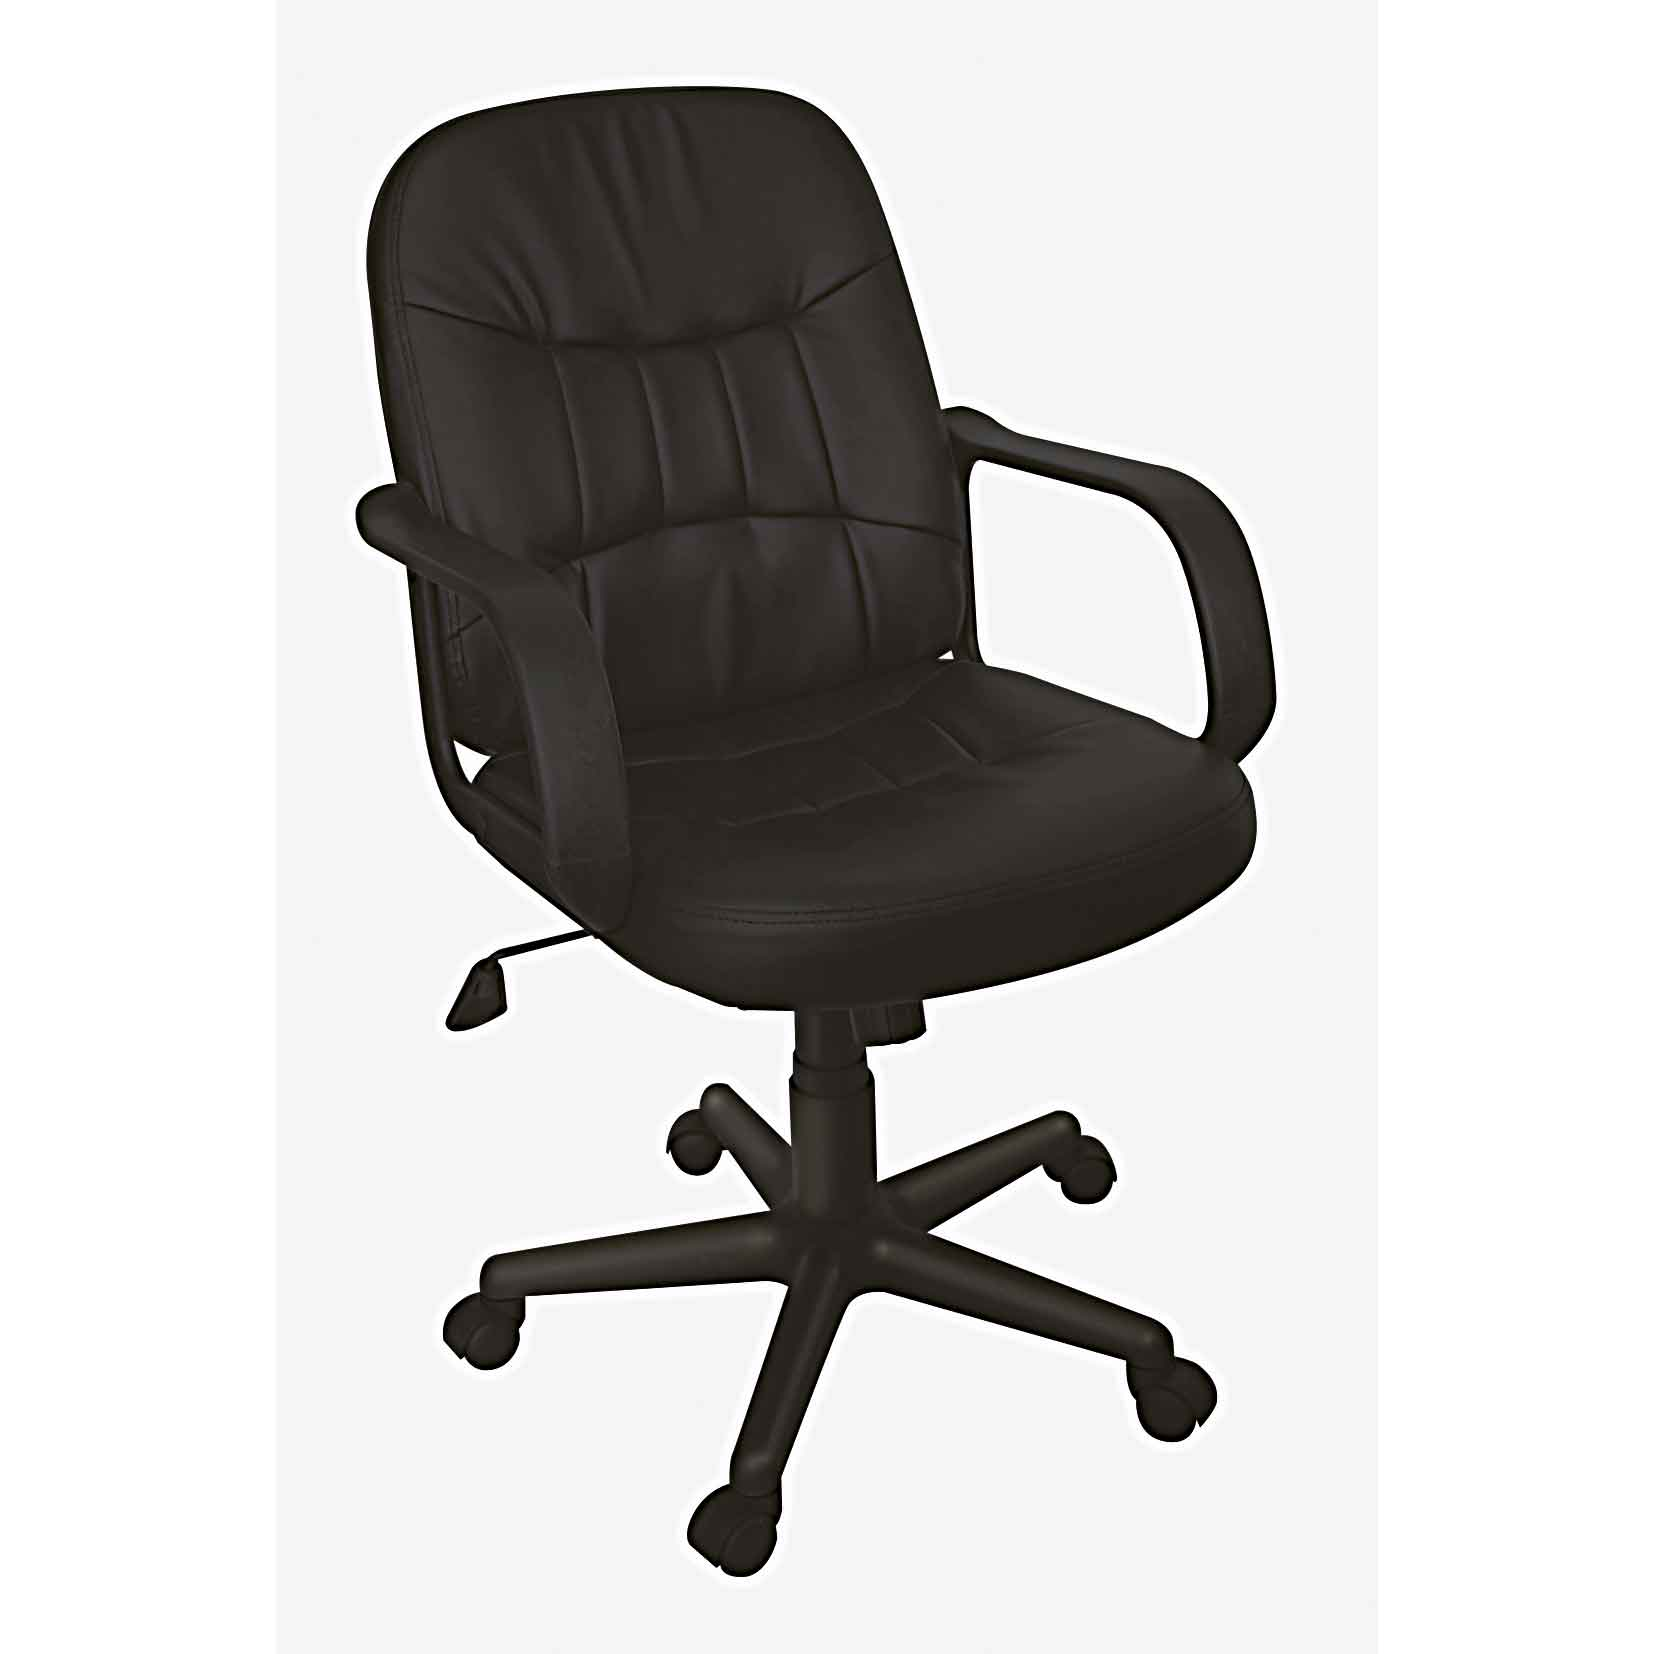 silla ejecutiva betel grupo meta soluciones de limpieza